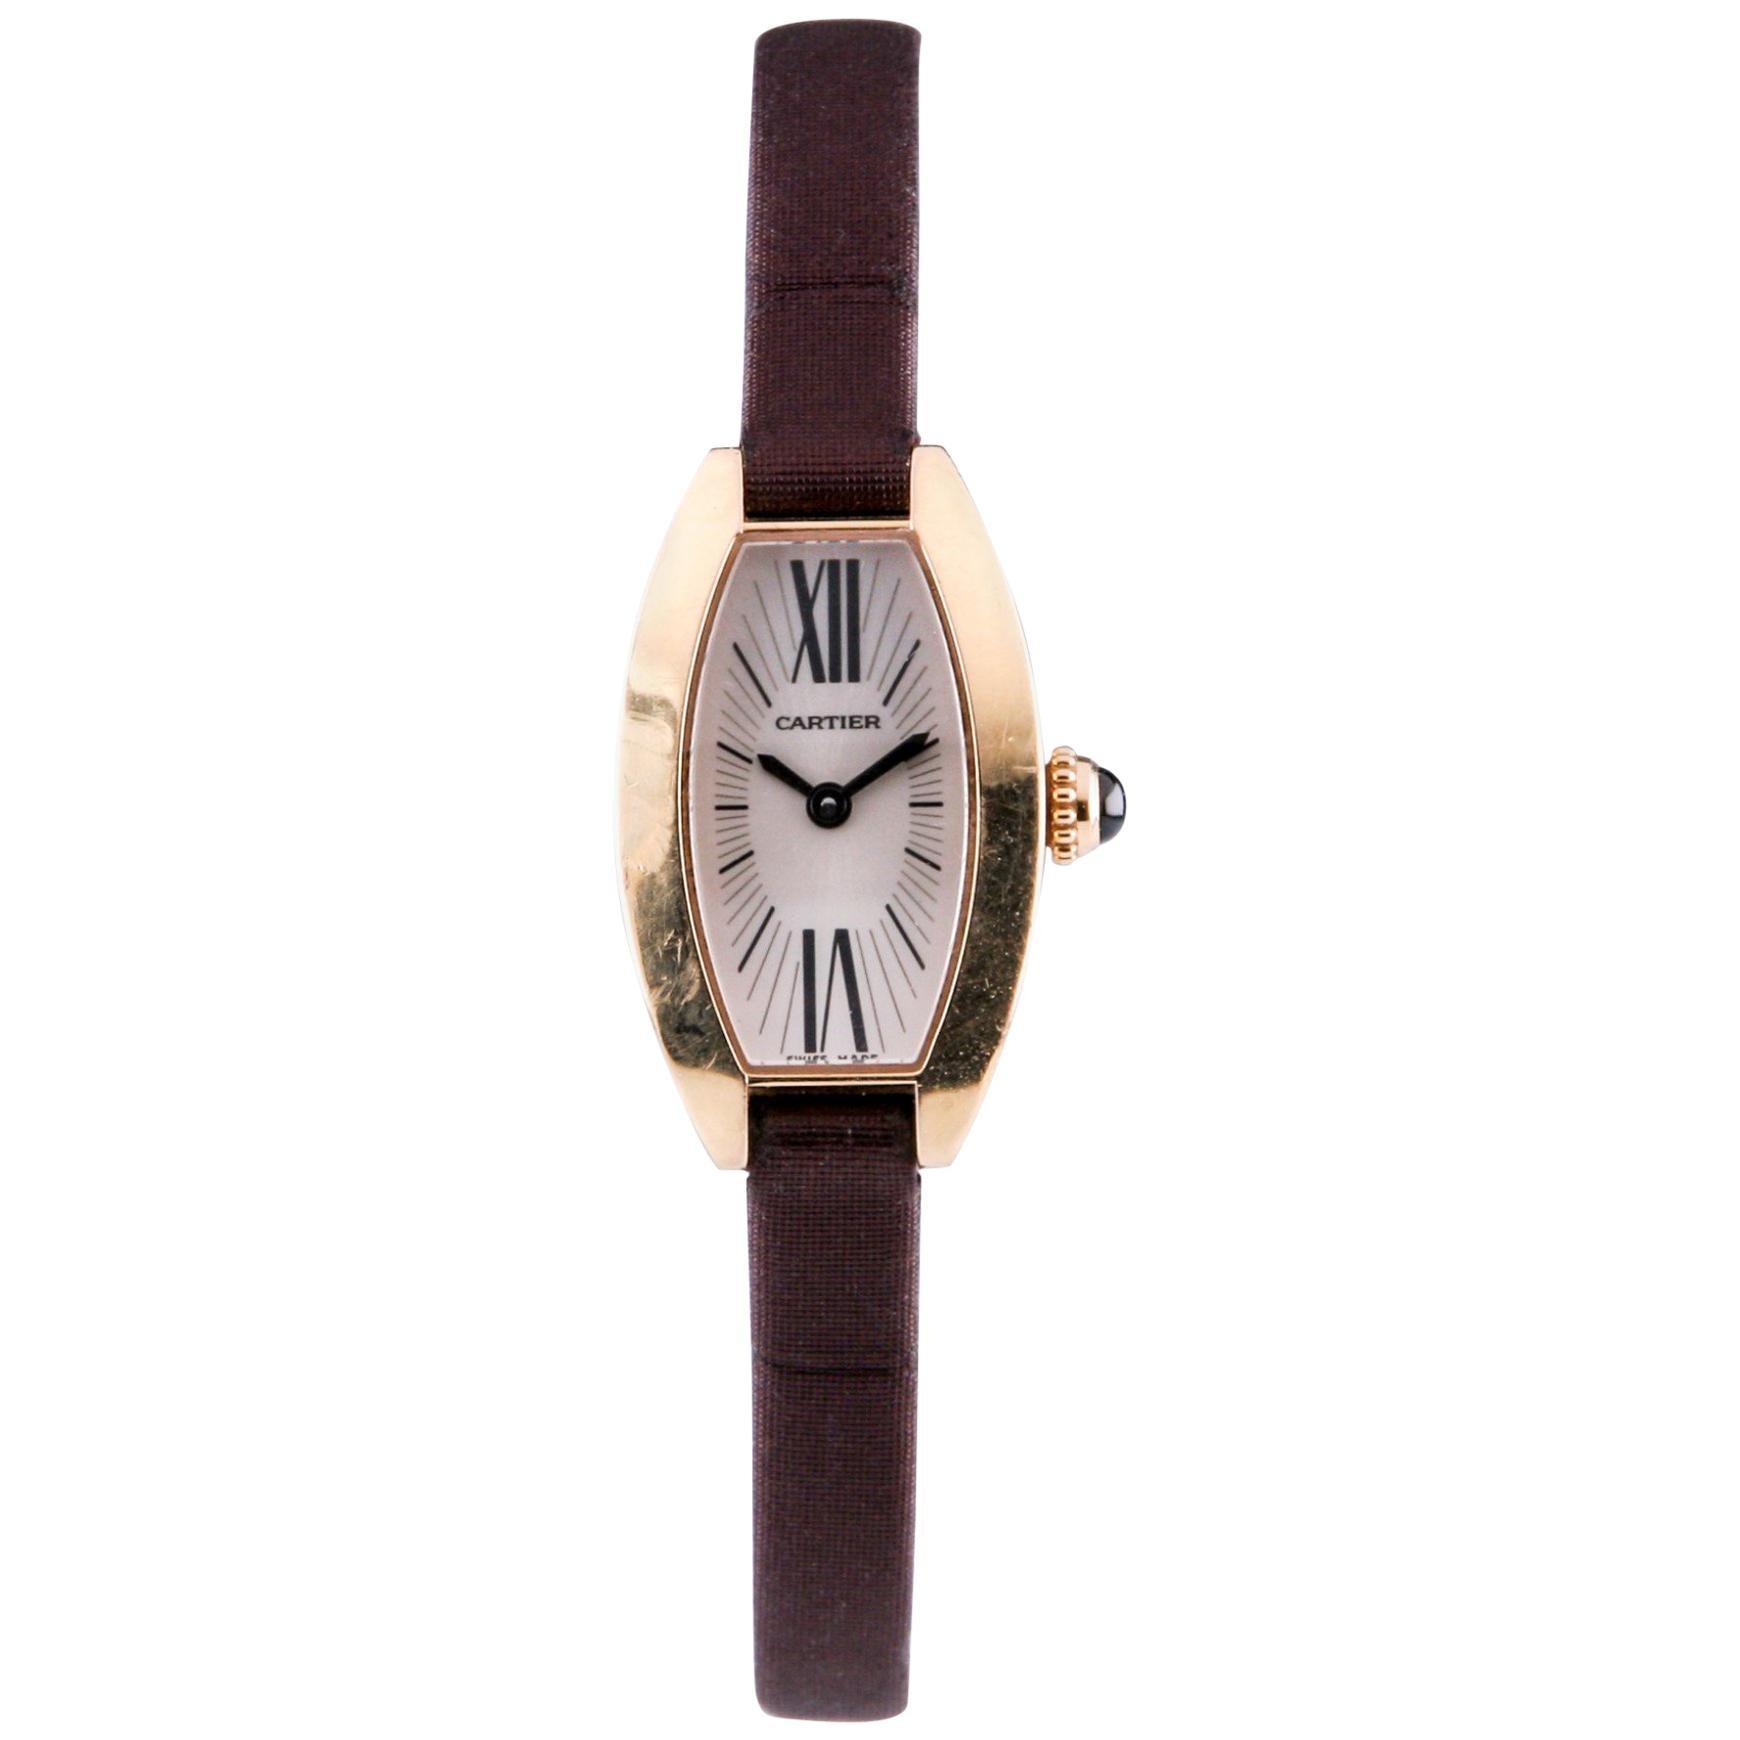 Cartier Mini Tonneau Lanieres 2592 18 Karat Gold Quartz Watch with Original Band